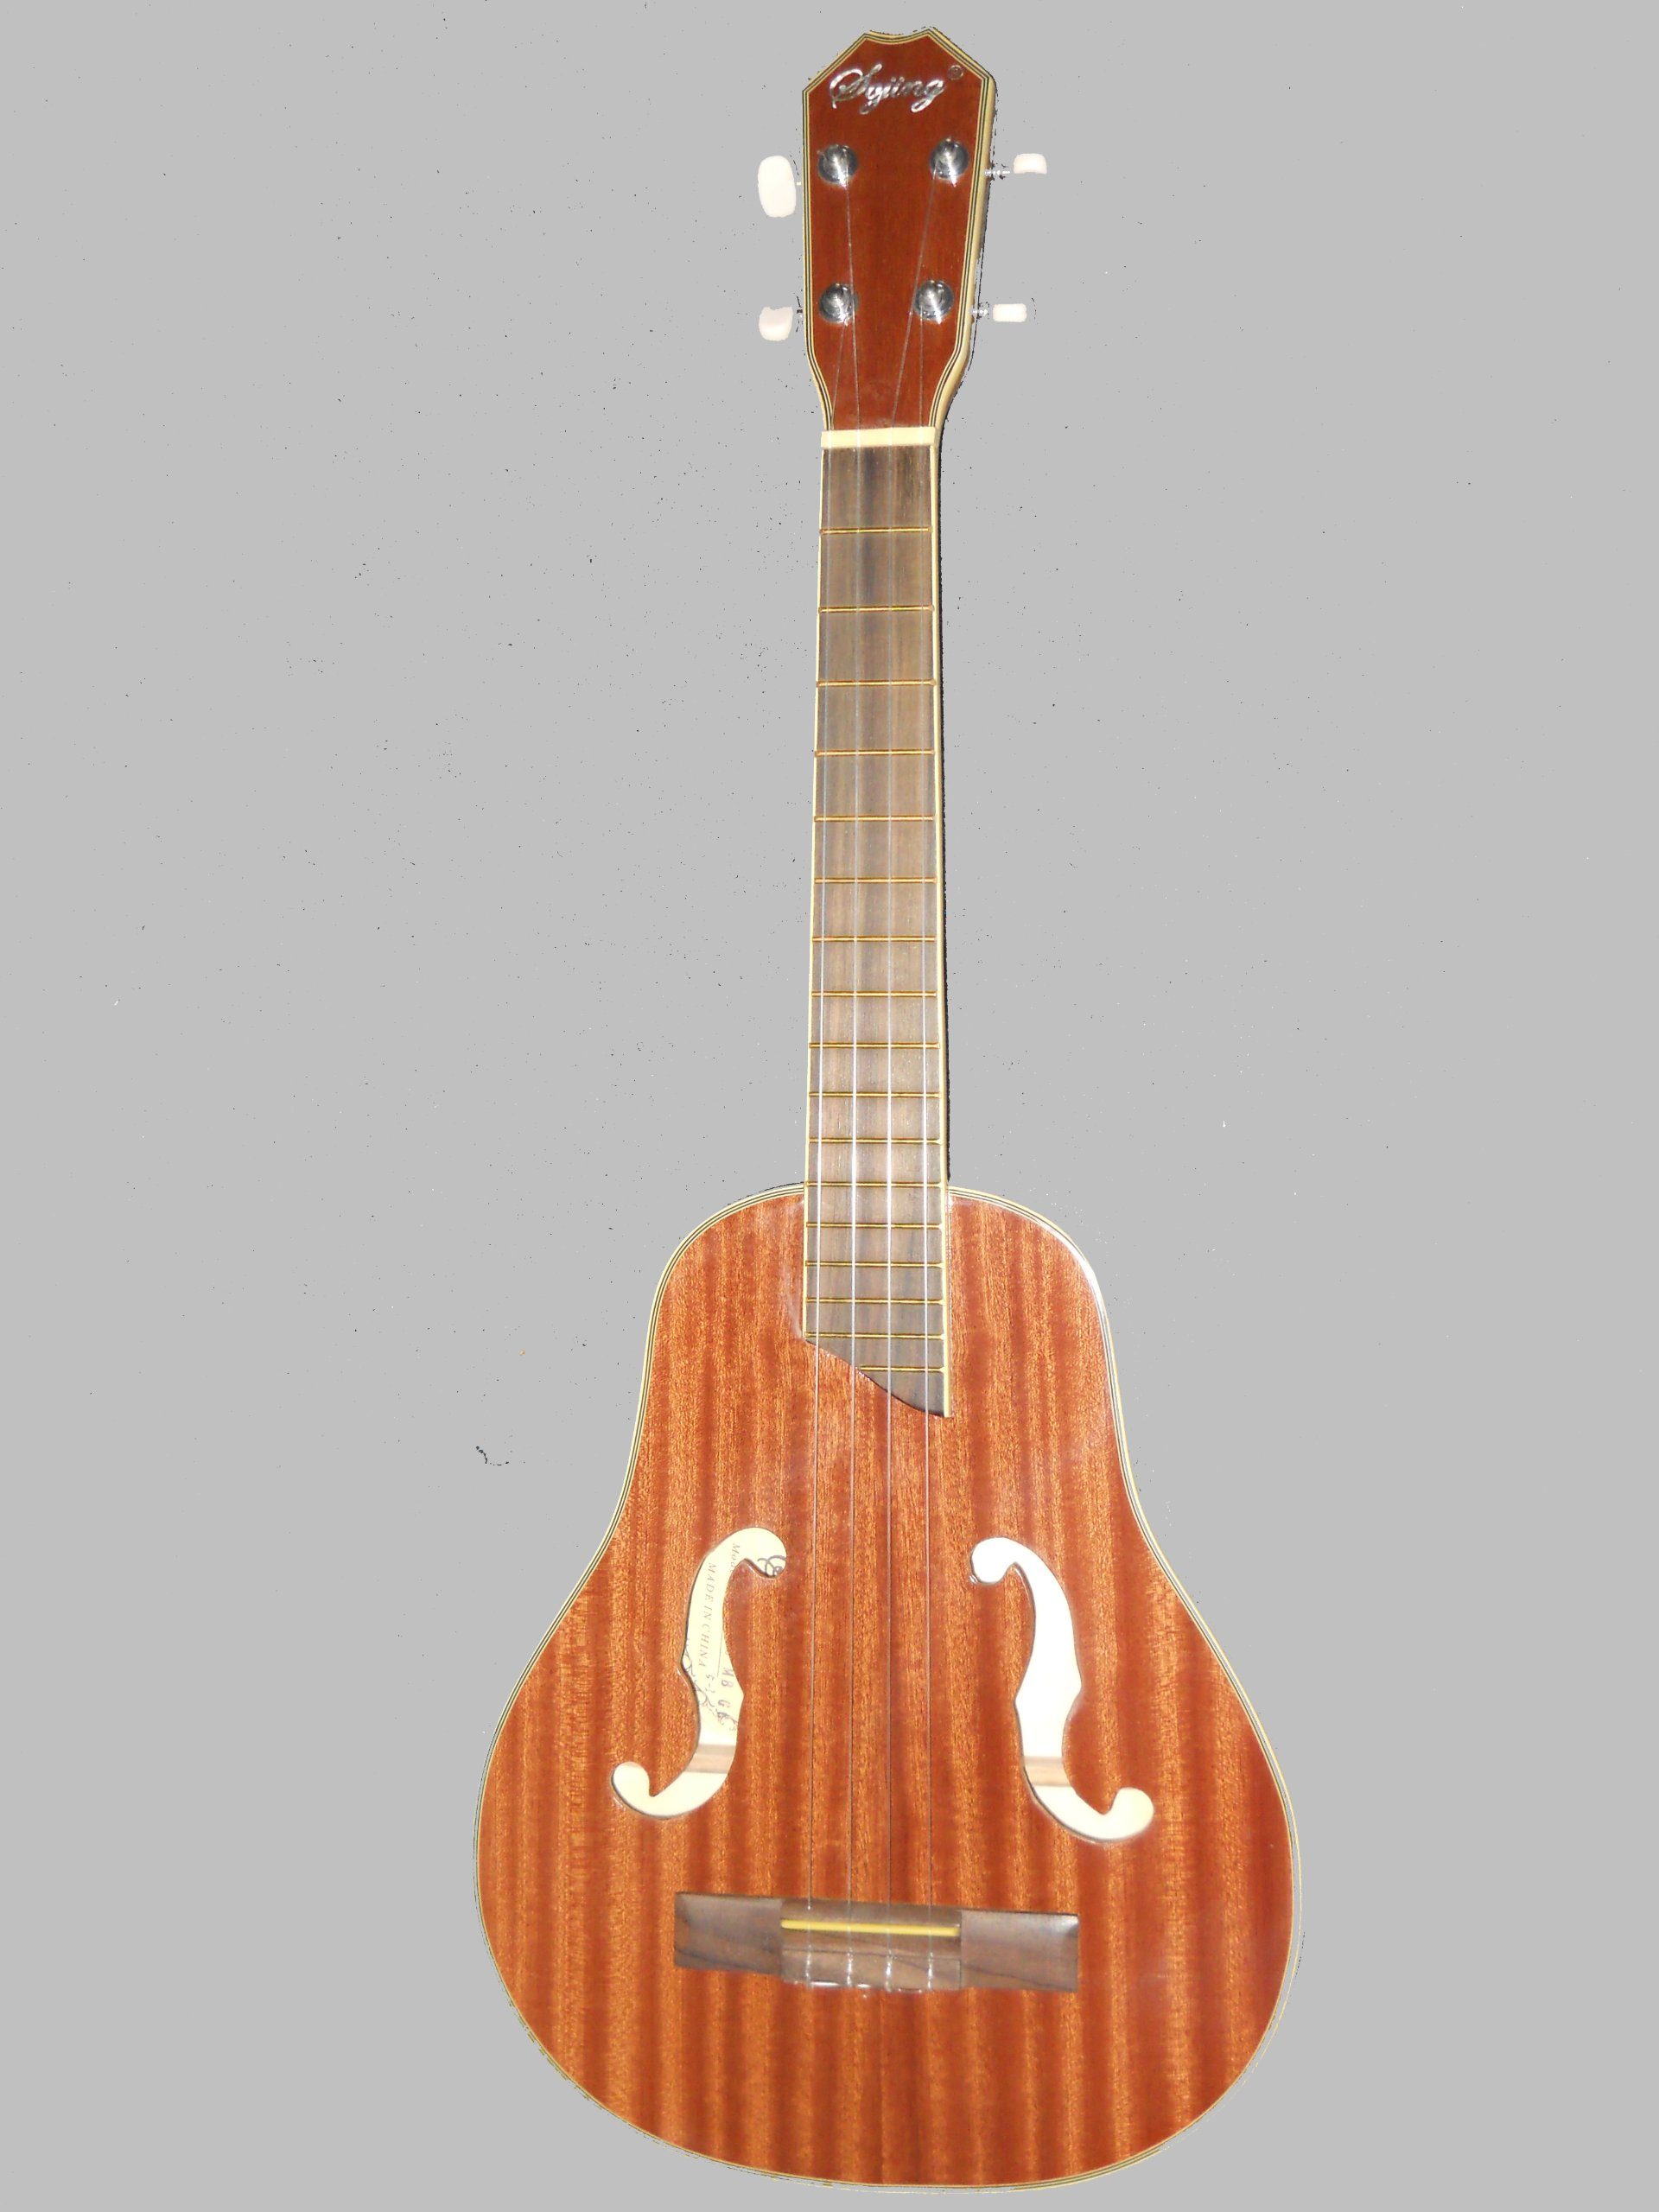 F Sound Hole 28'' Baritone Ukulele(convertible to a Tenor Guitar) by Sojing (Image #1)